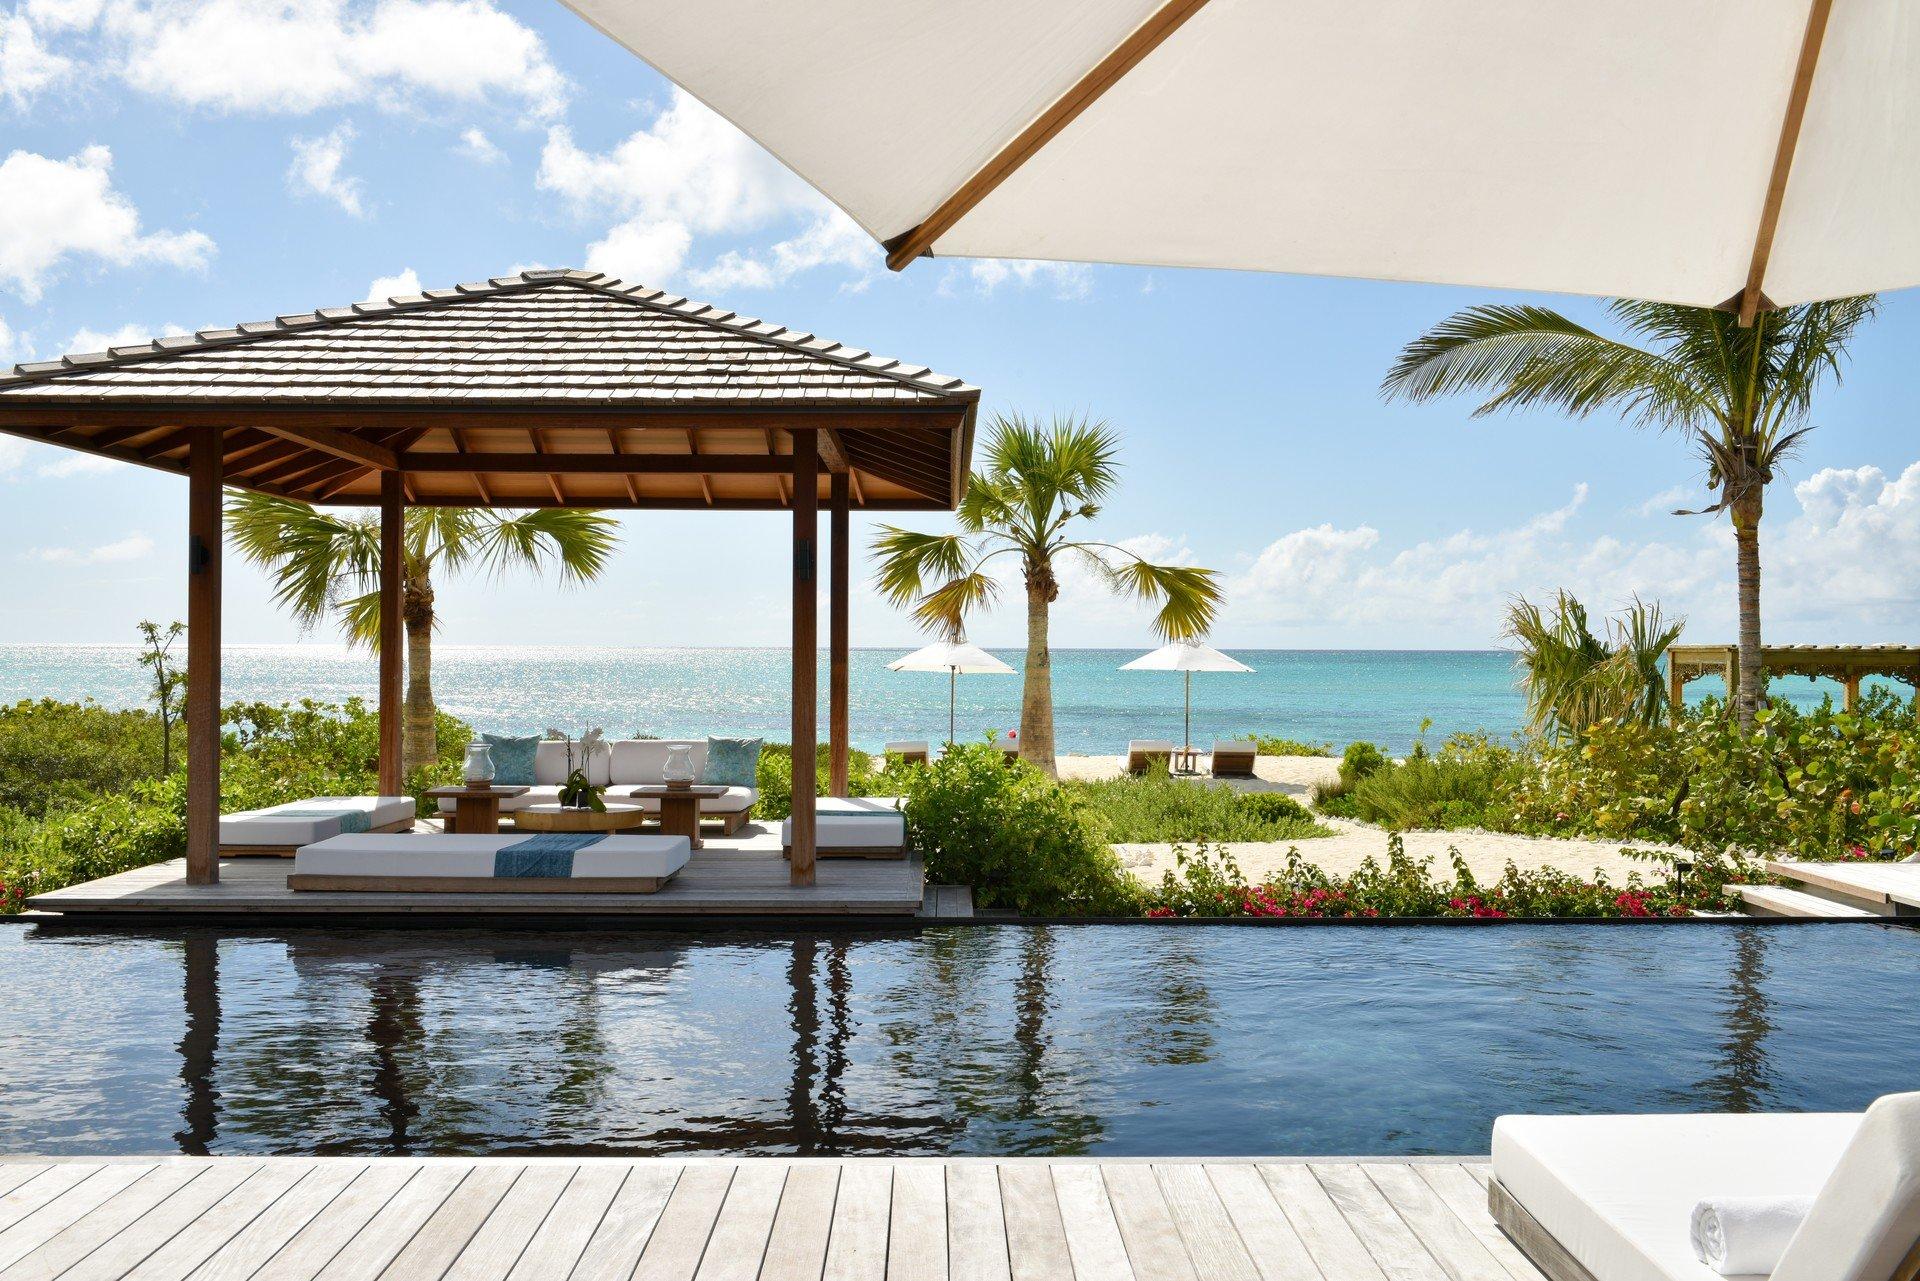 Hotels sky outdoor tree water swimming pool leisure property Resort vacation estate Villa condominium caribbean cottage overlooking Deck shore shade